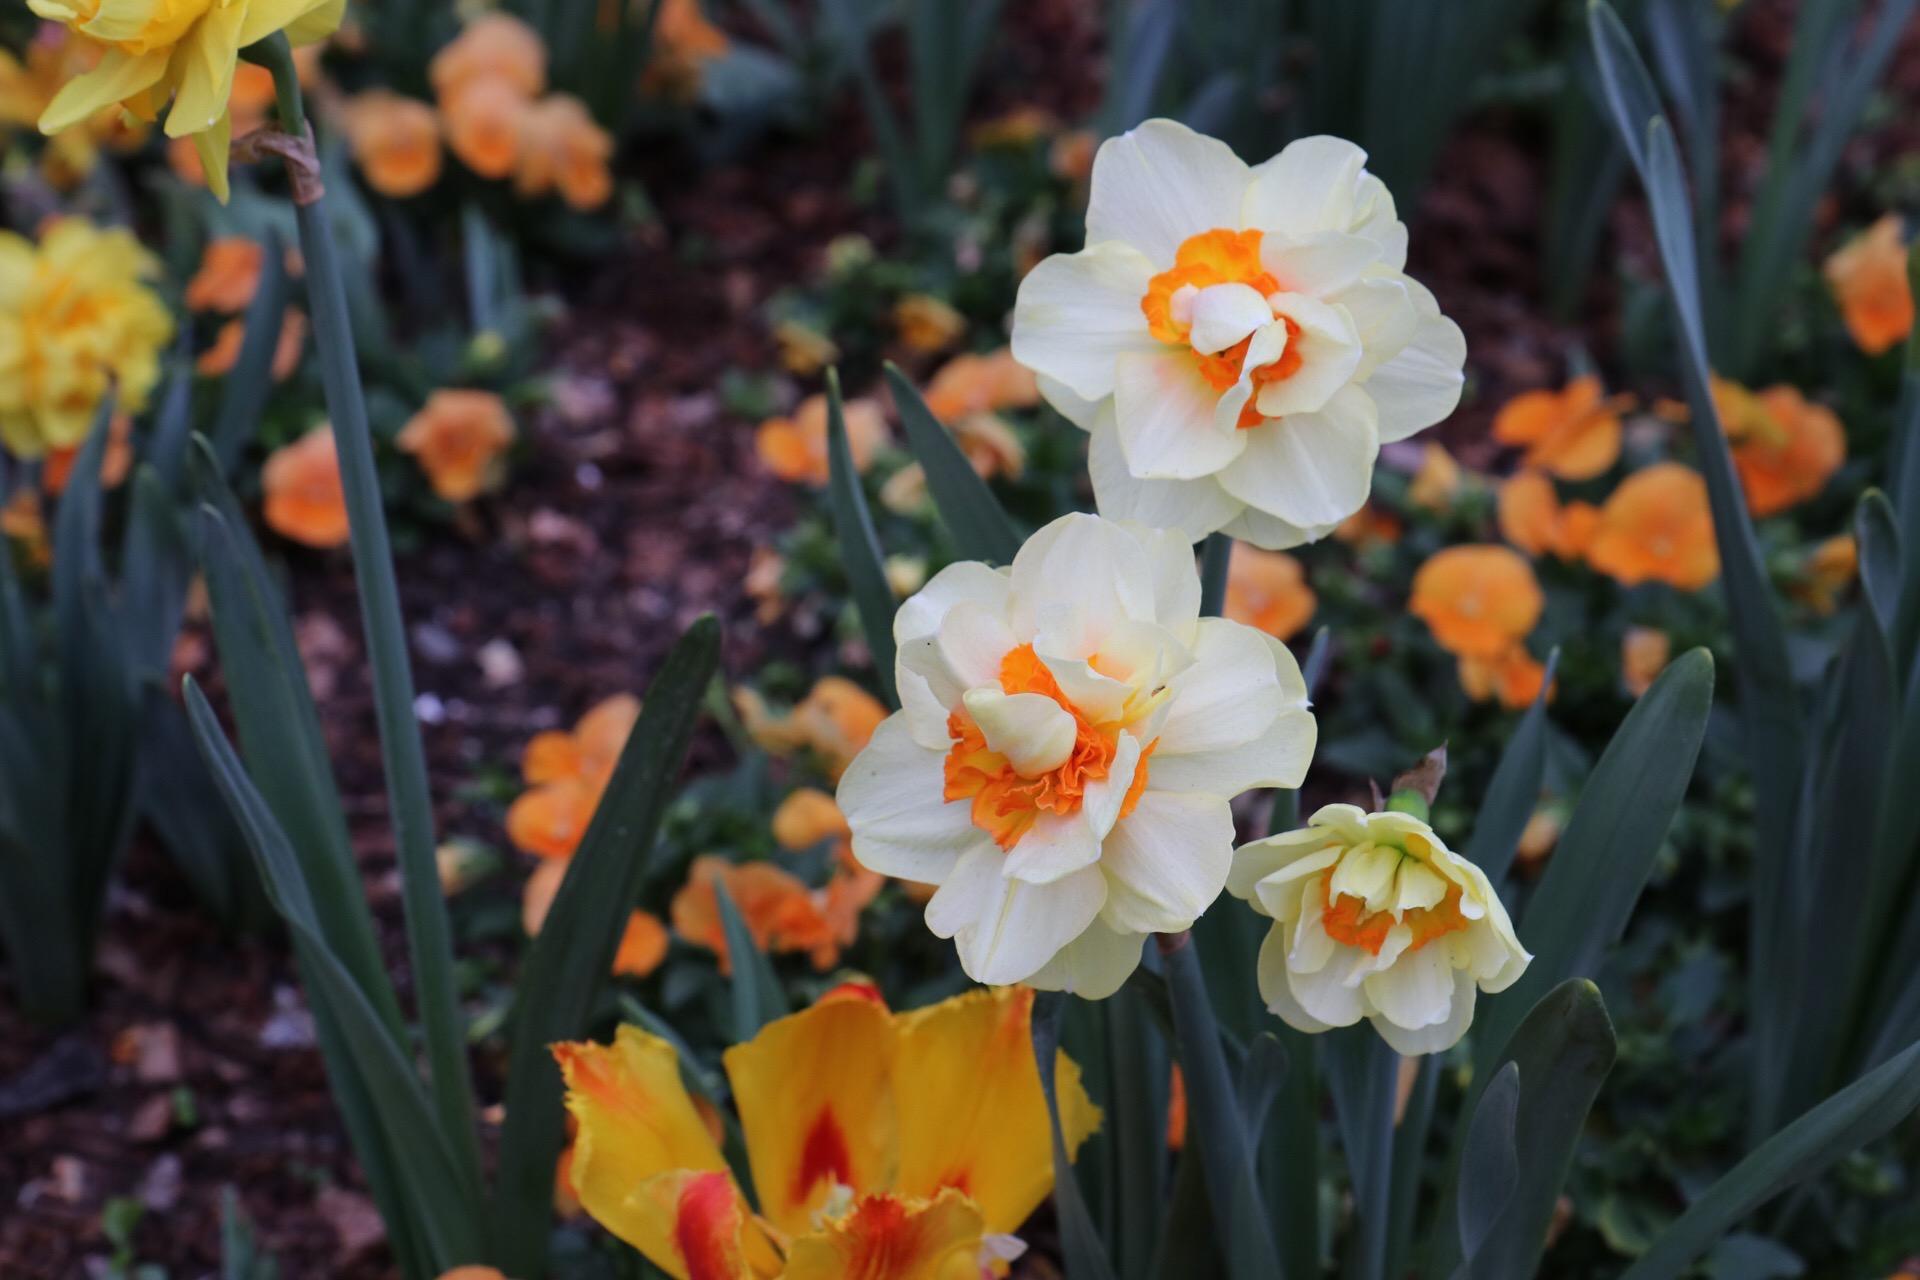 daffodils arboretum IMG_0201 (1)